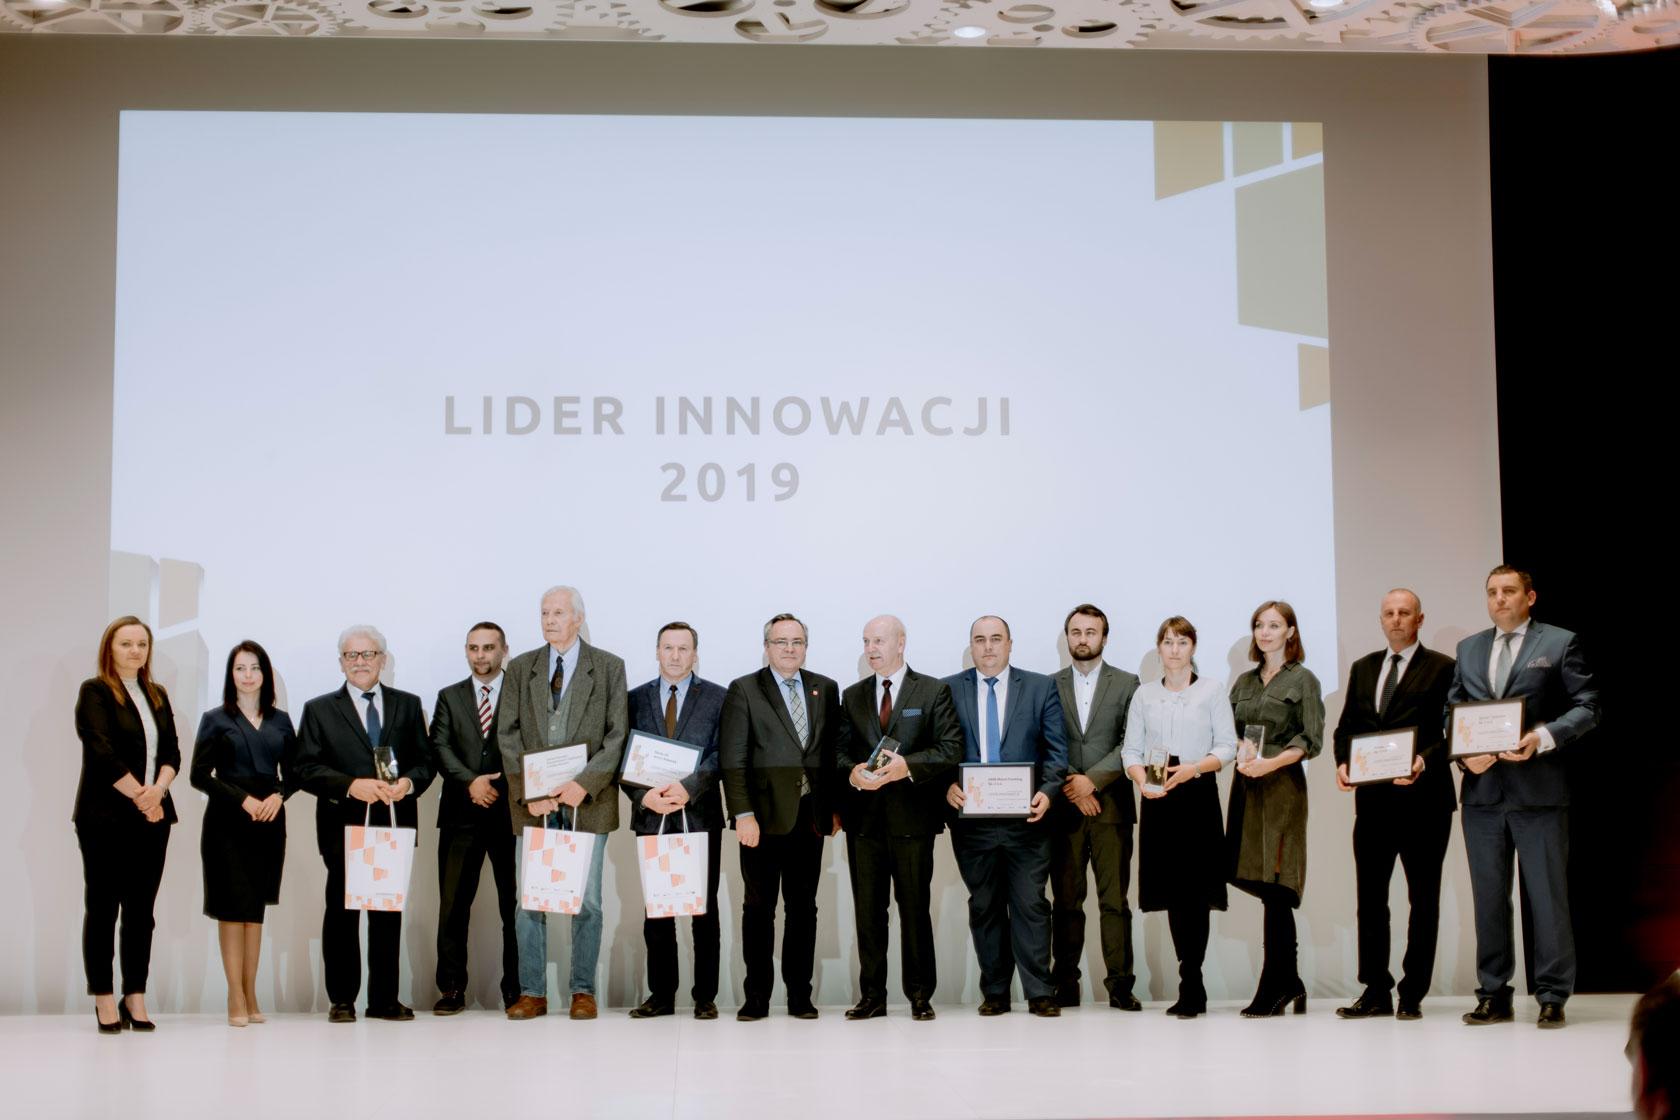 We've been honoured by Leader of Innovation 2019 prize